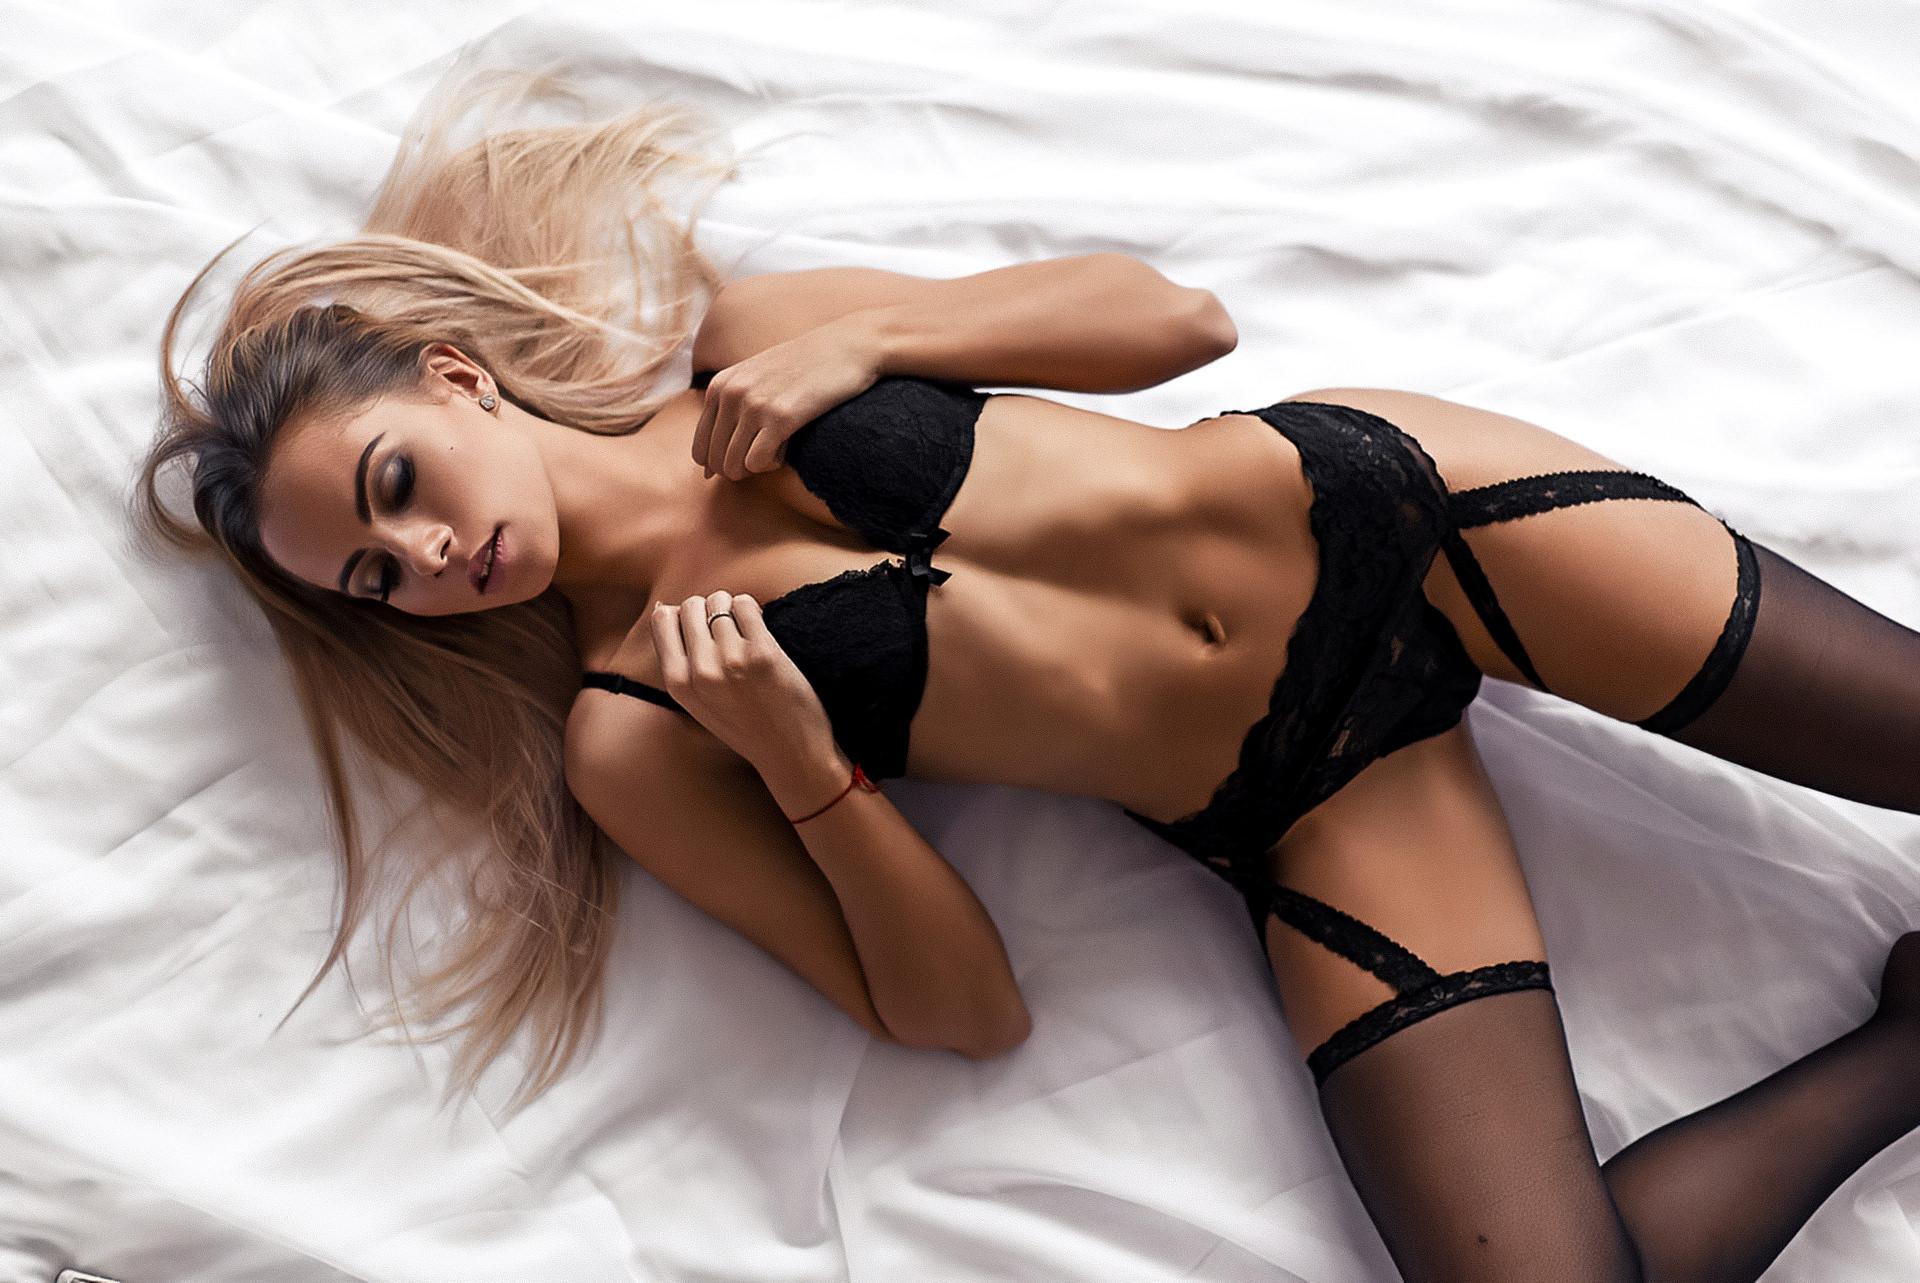 Wallpaper aislin, bed, babe, lingerie, brunette, ass